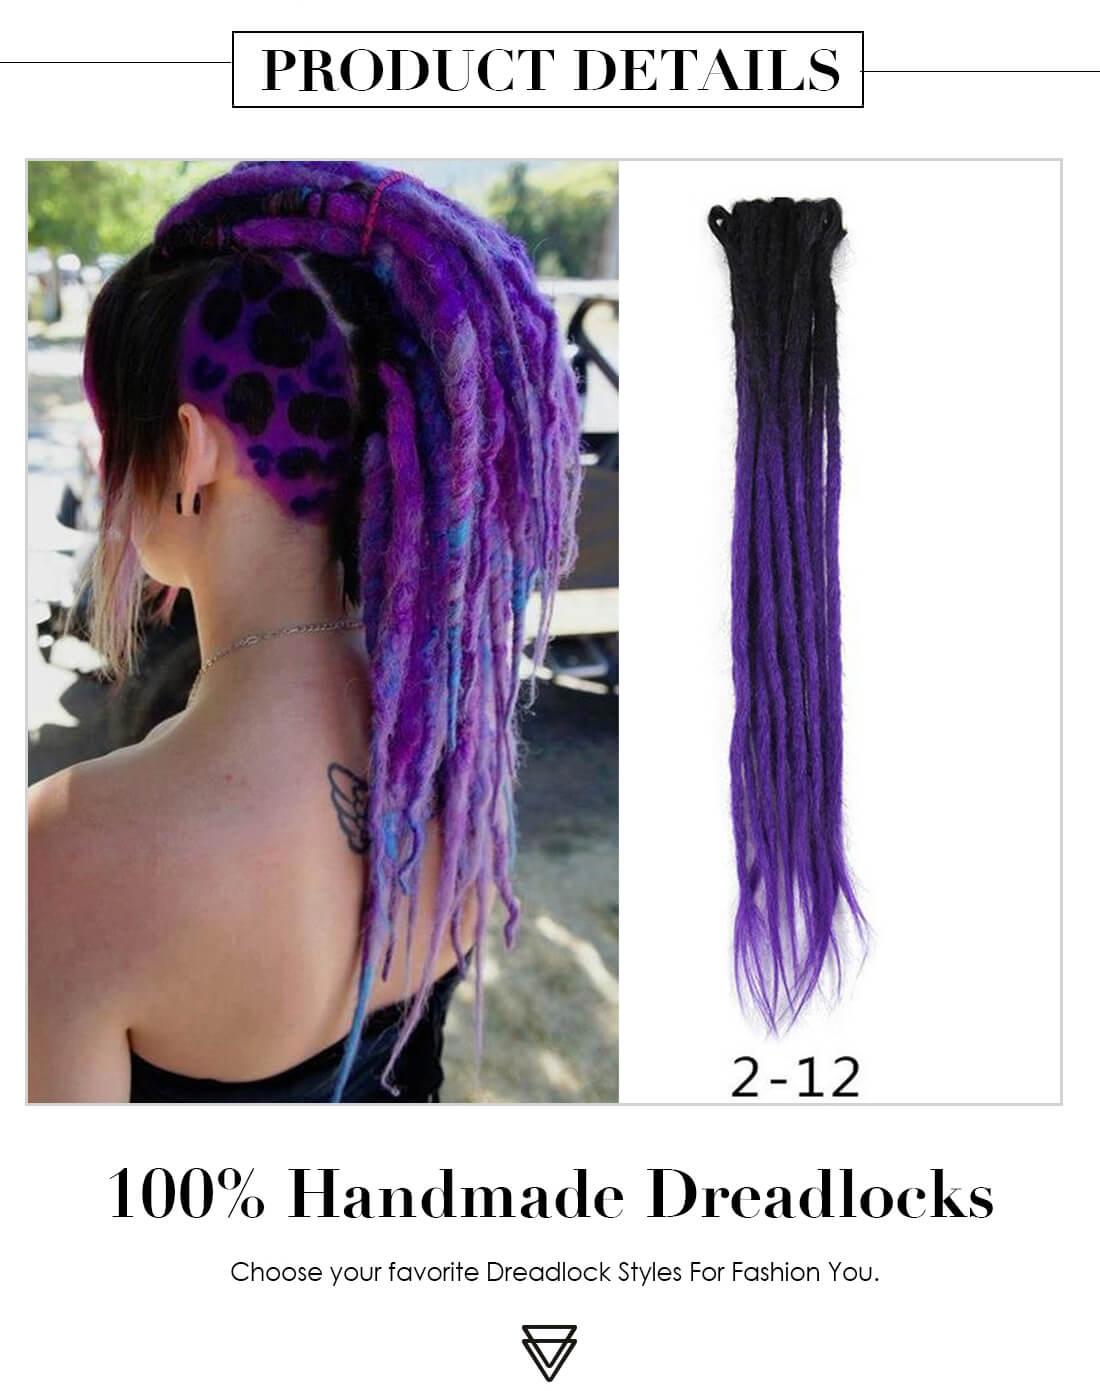 Black/Purple 2-12 Crochet Hair Dreadlock Extensions